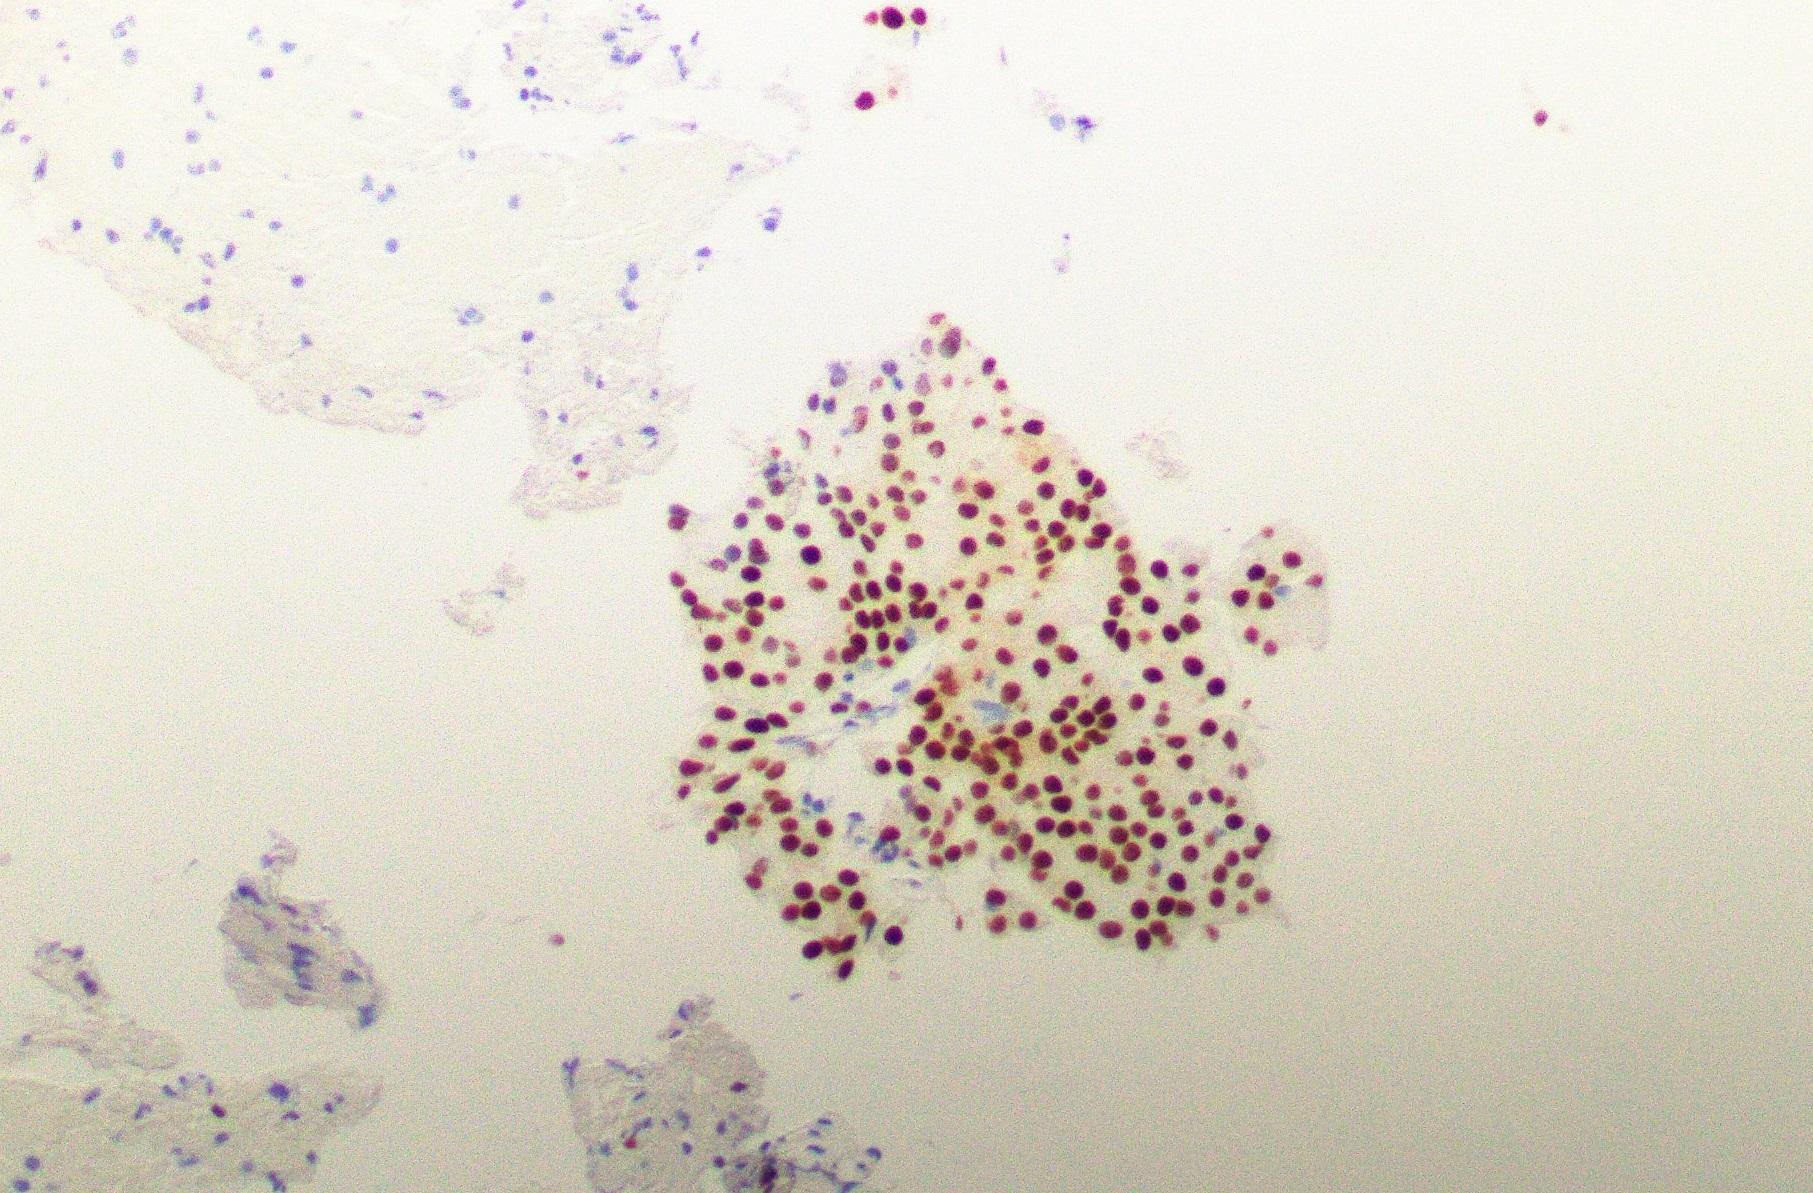 NR4A3 nuclear stain